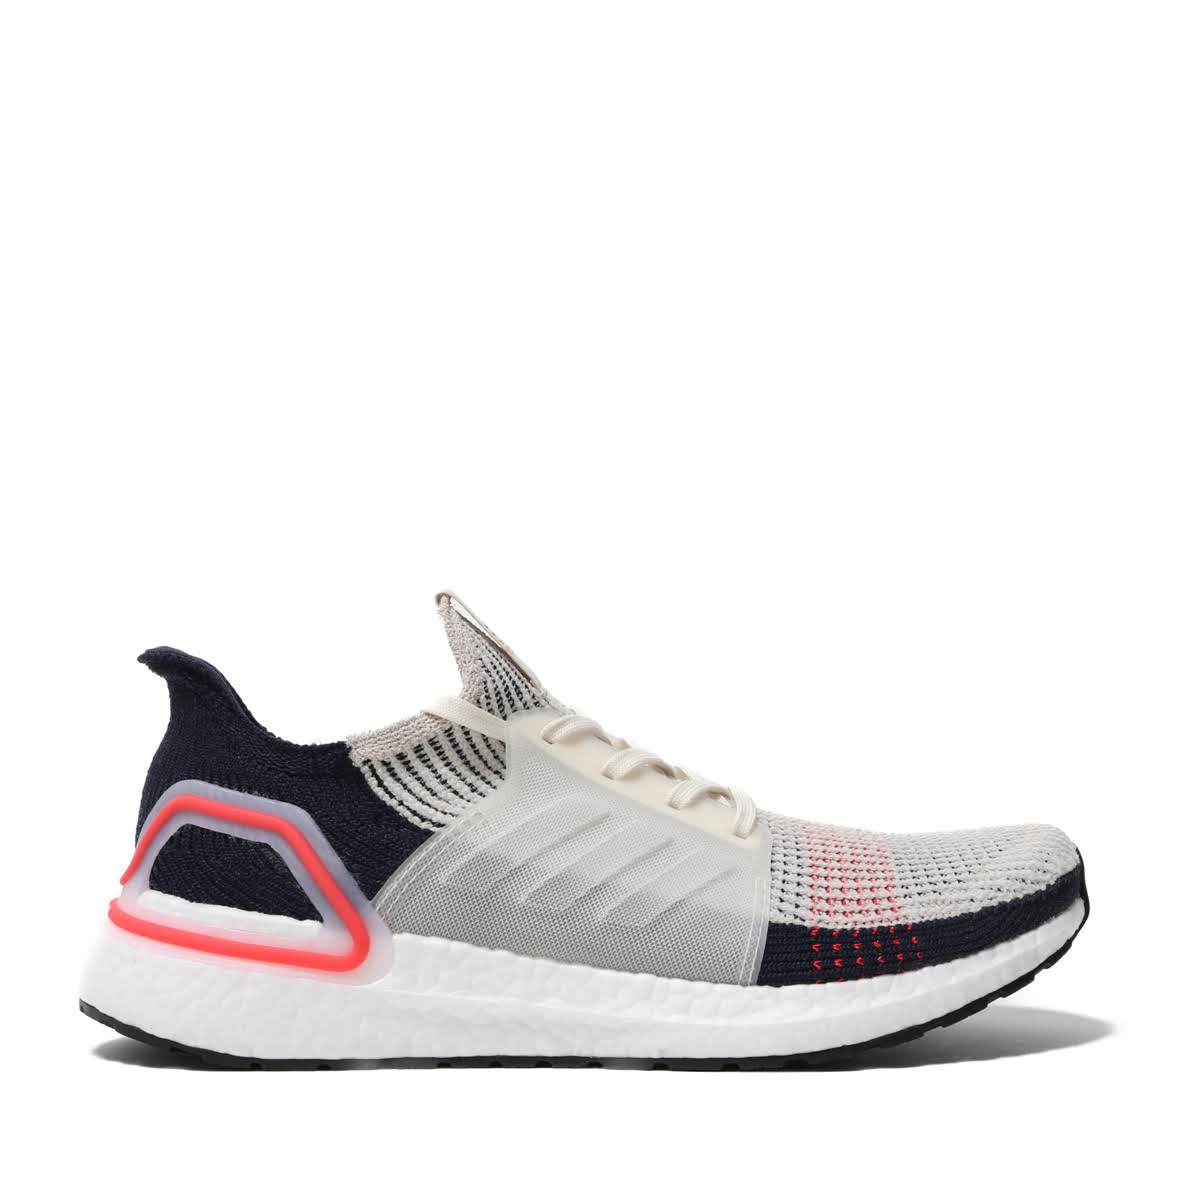 adidas UltraBOOST 19 (CLEAR BROWNCHALK WHITERUNNING WHITE) (Adidas ultra boost 19)